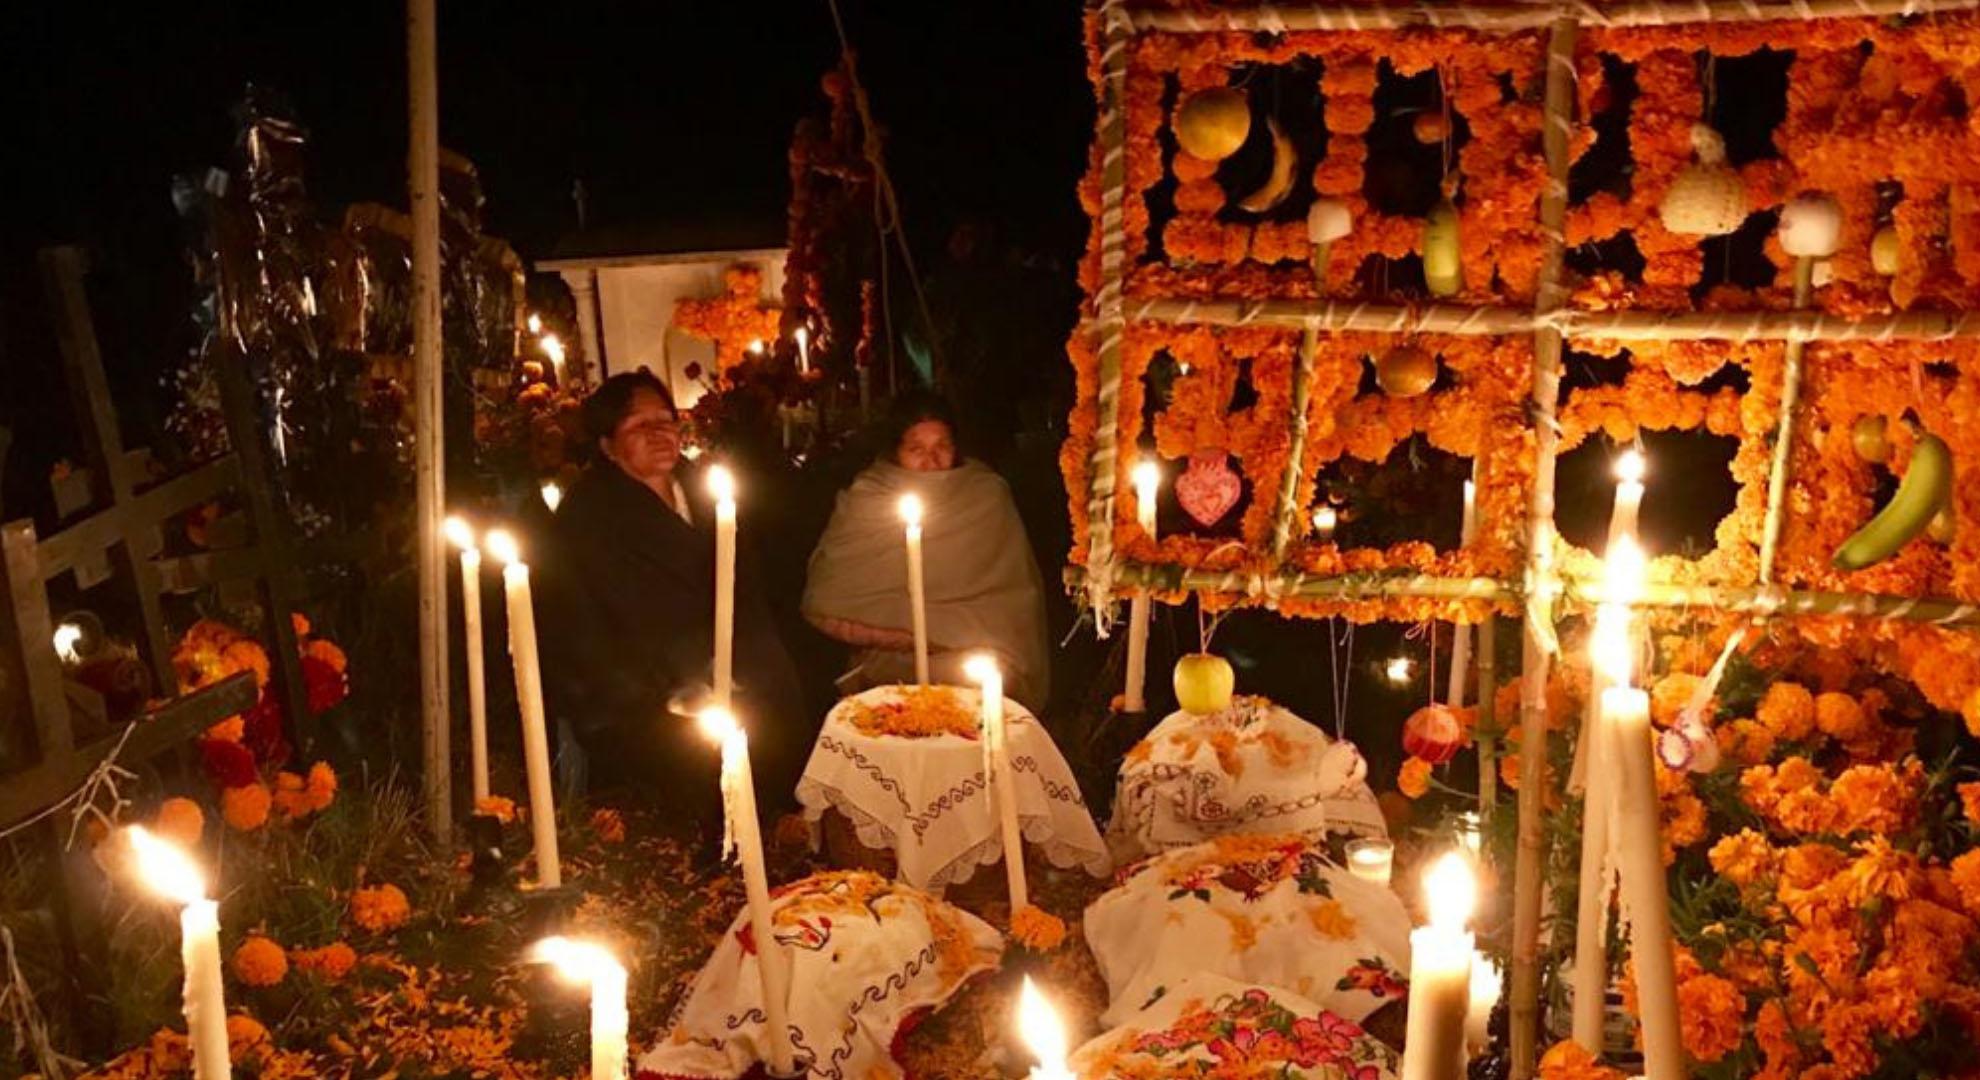 The Día de Muertos celebration in an indigenous community.